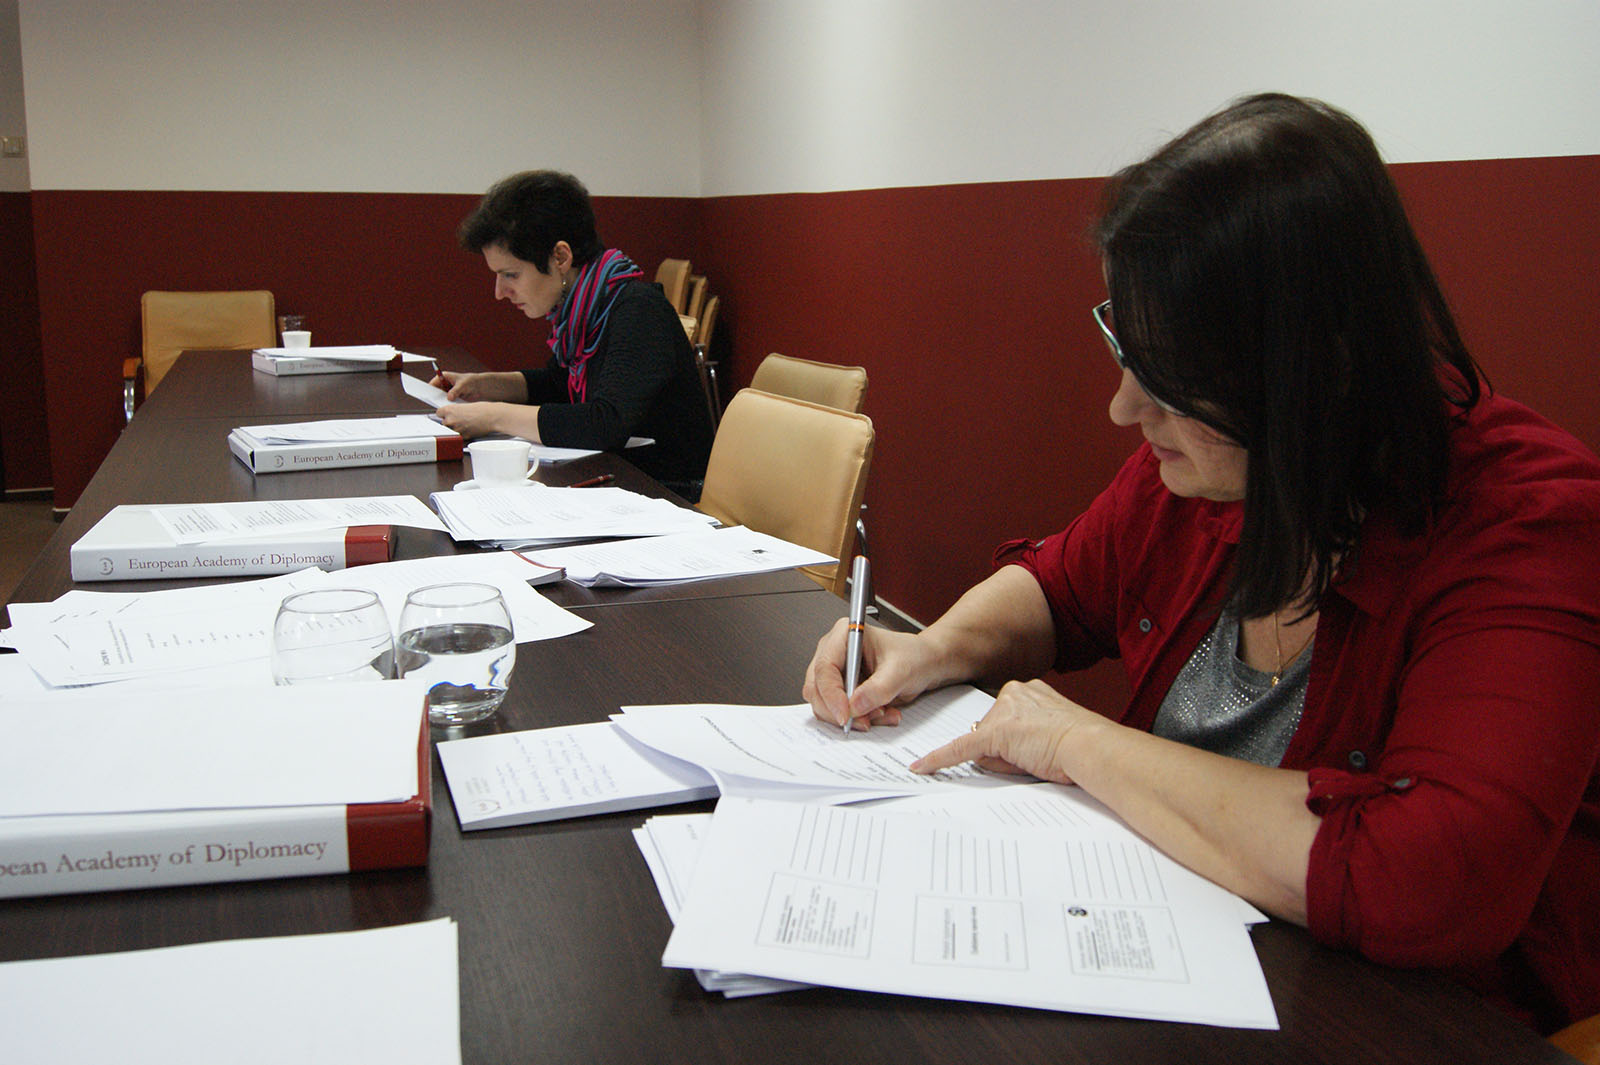 Profesjonalny sekretariat